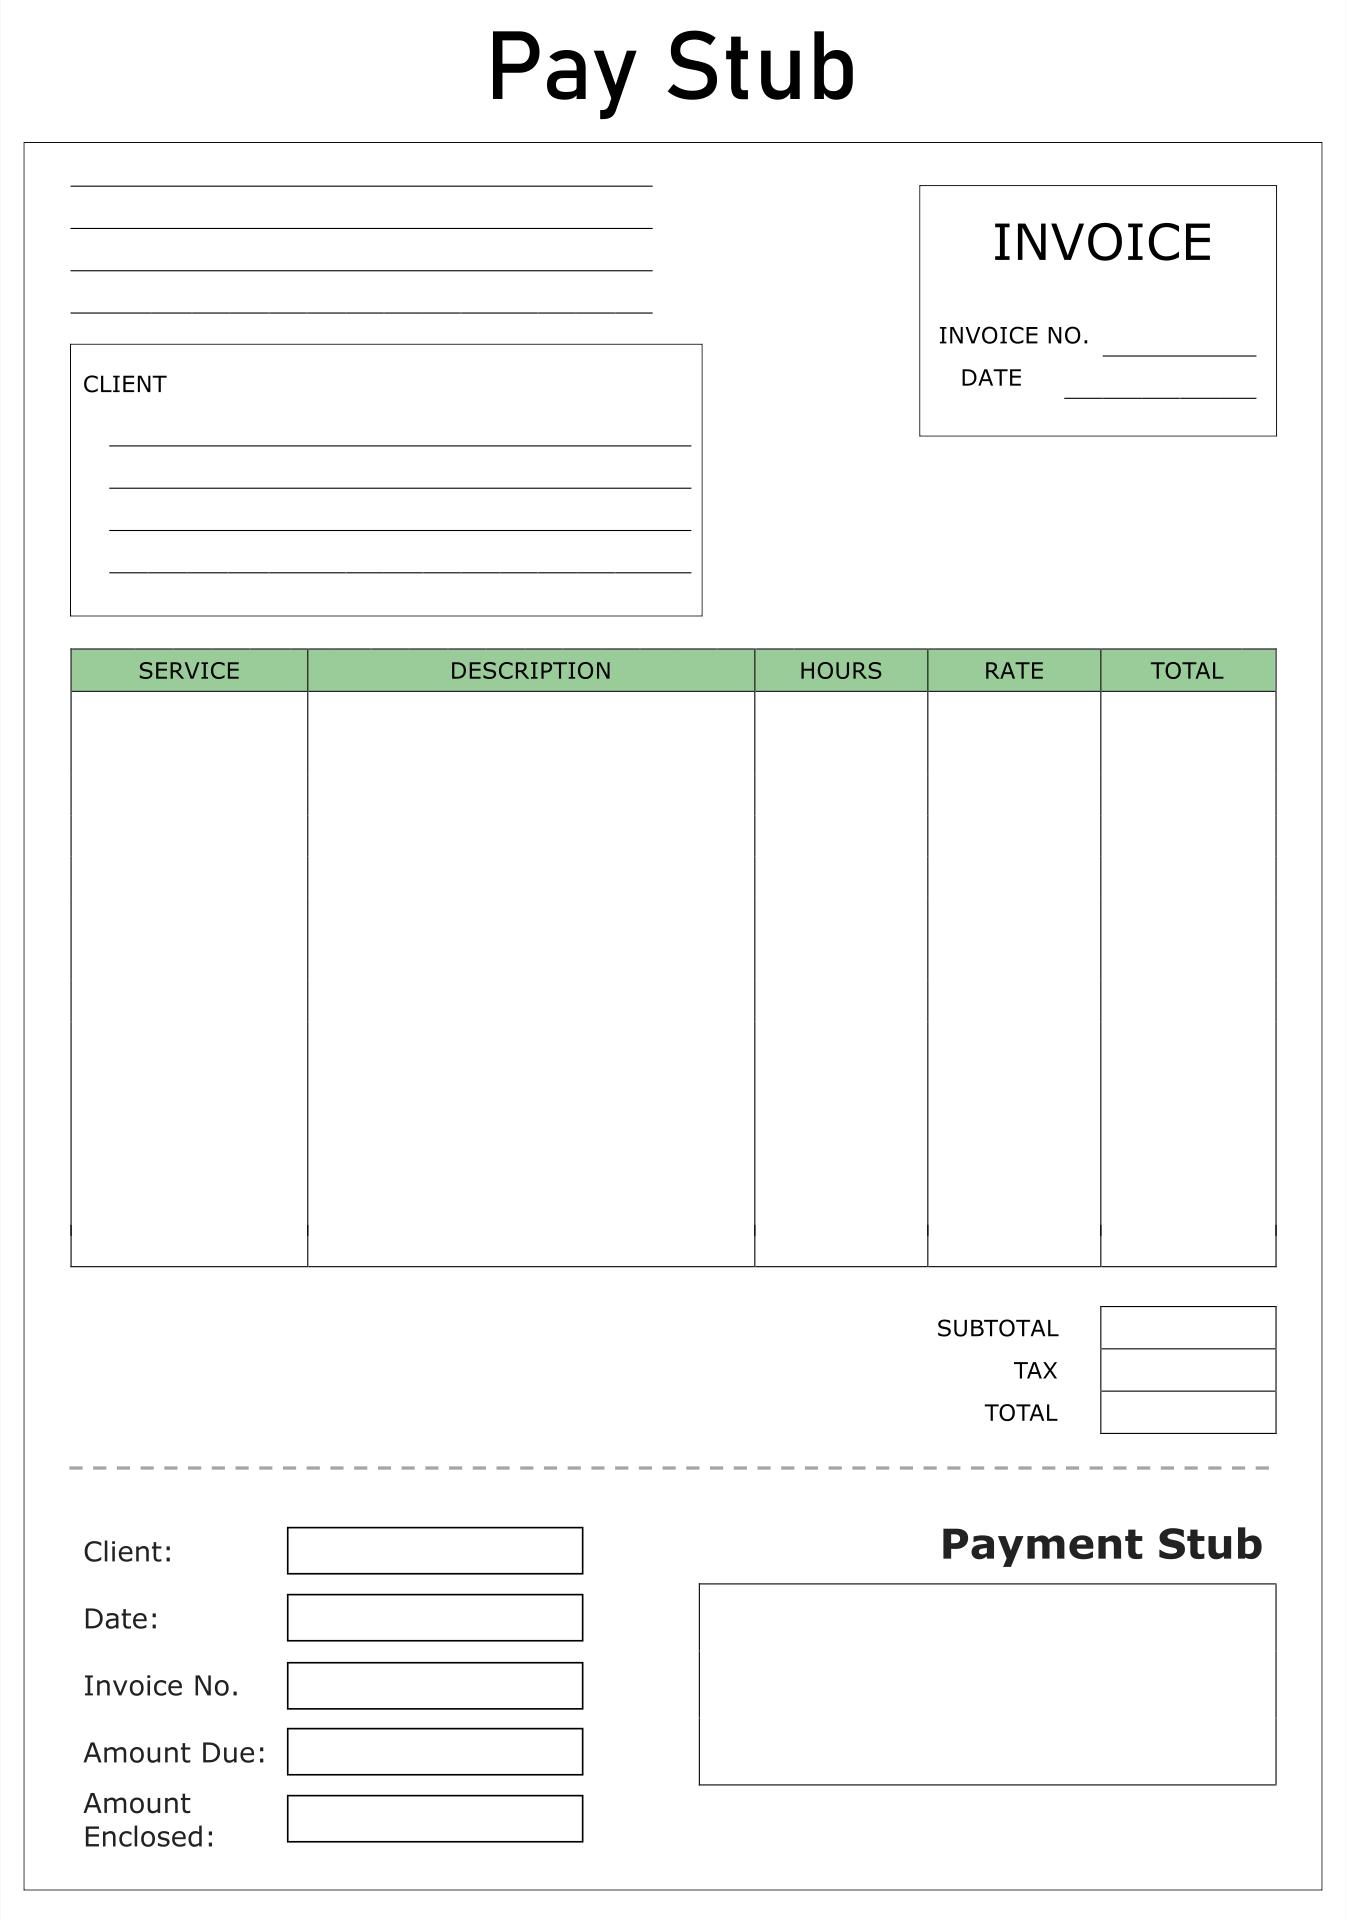 Printable Blank Payroll Check Template Free